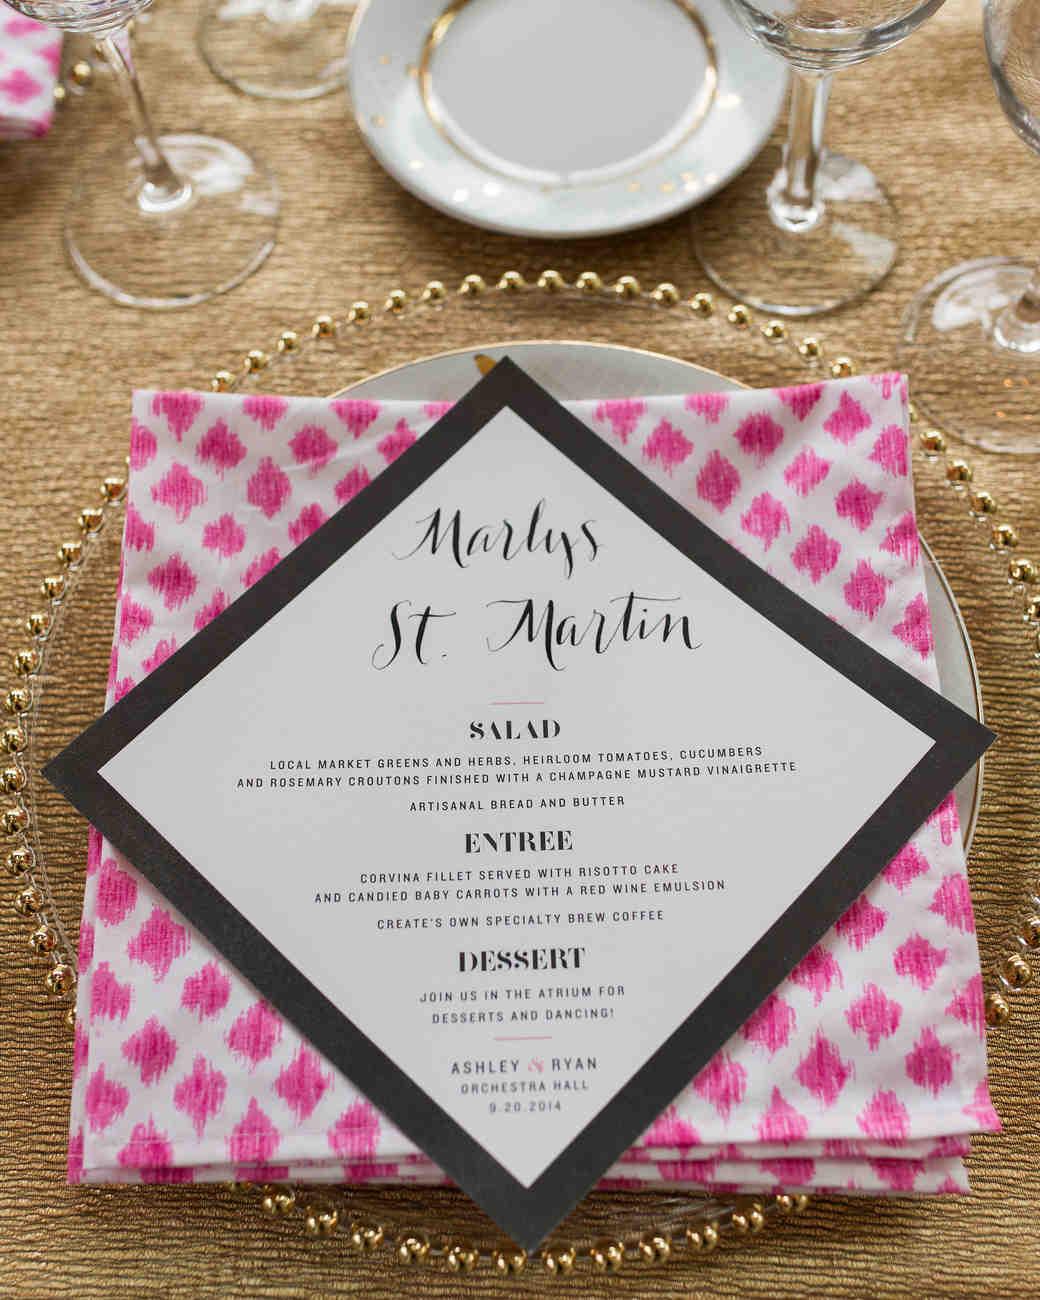 ashley-ryan-wedding-placesetting-11219-s111852-0415.jpg